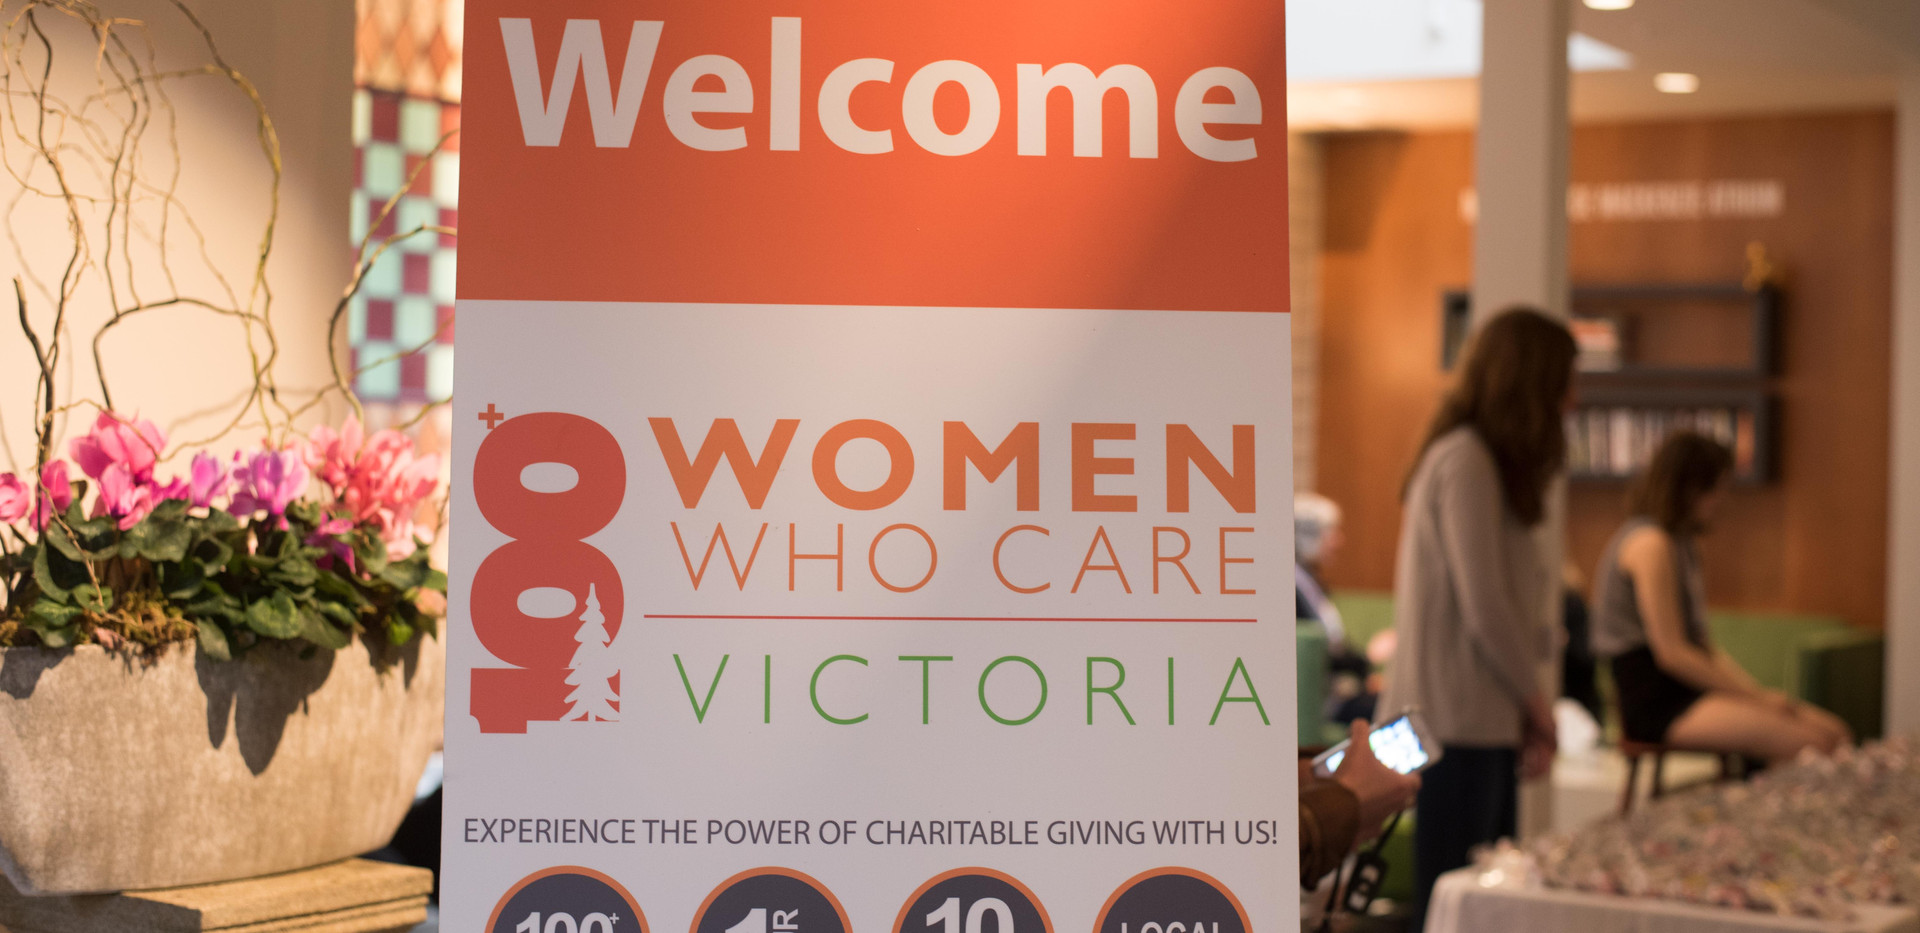 100 Women Victoria